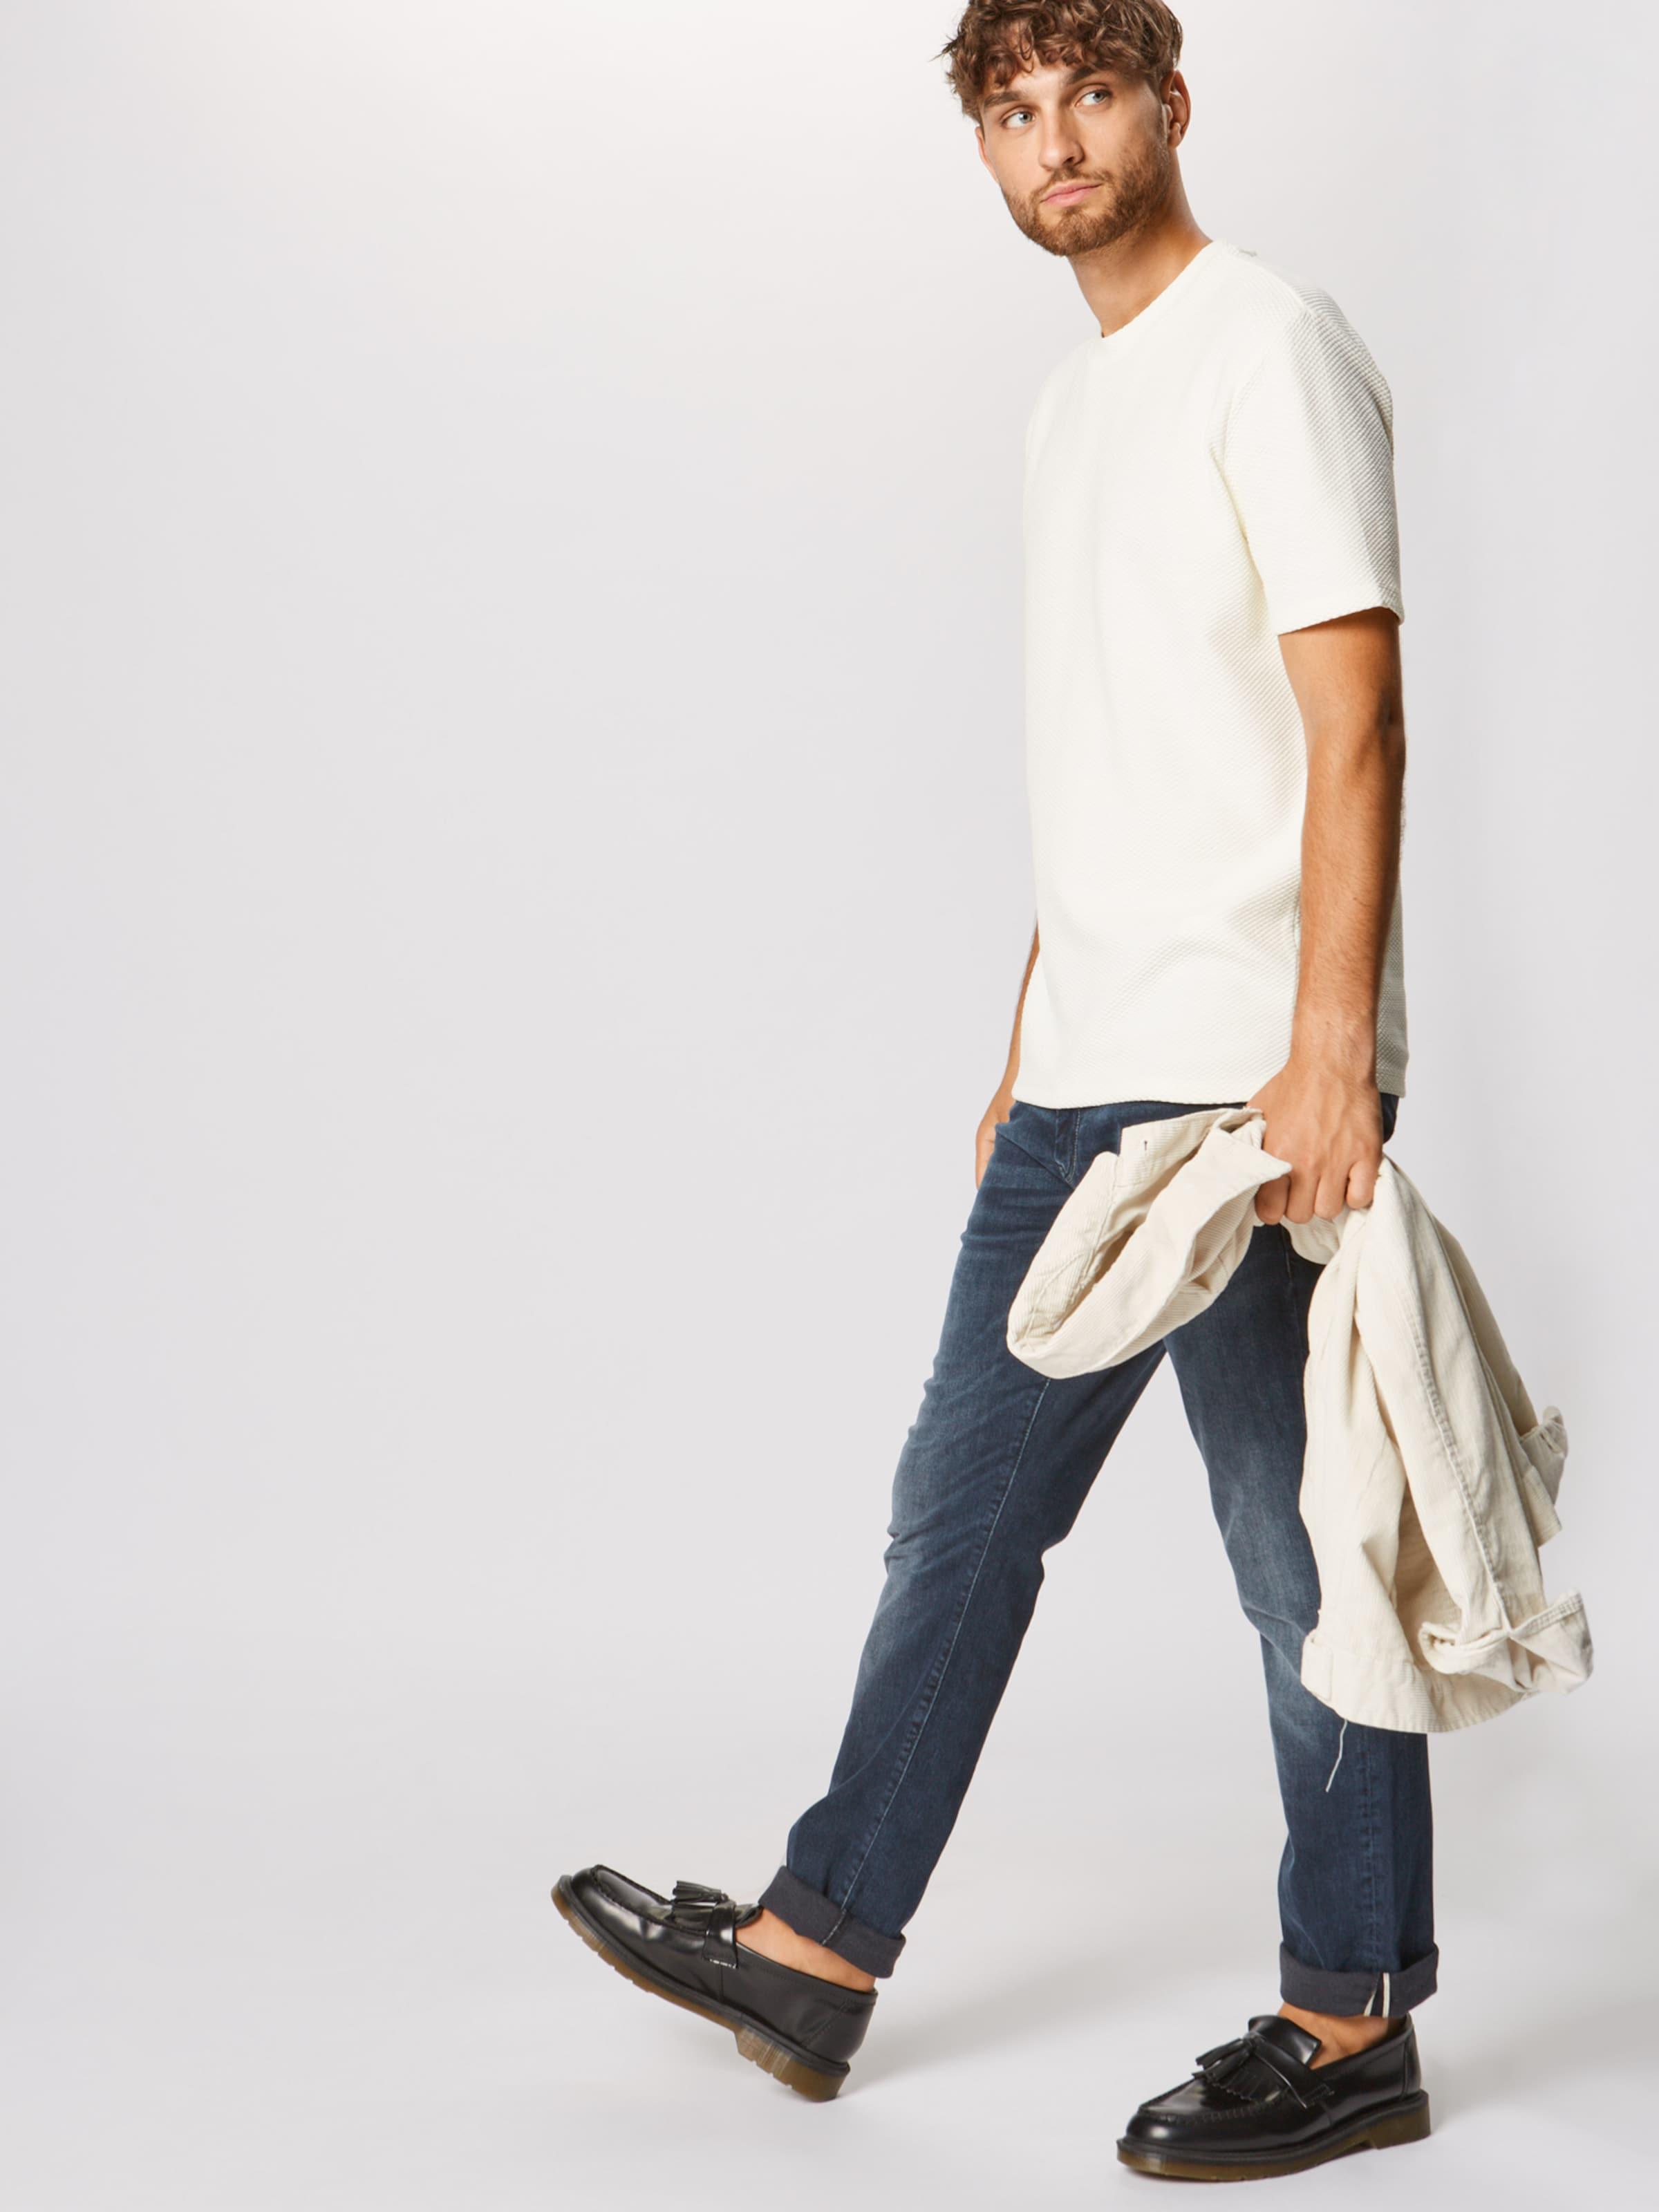 Blanc 'dingbo' T Hugo En shirt Naturel 345RLjAcq